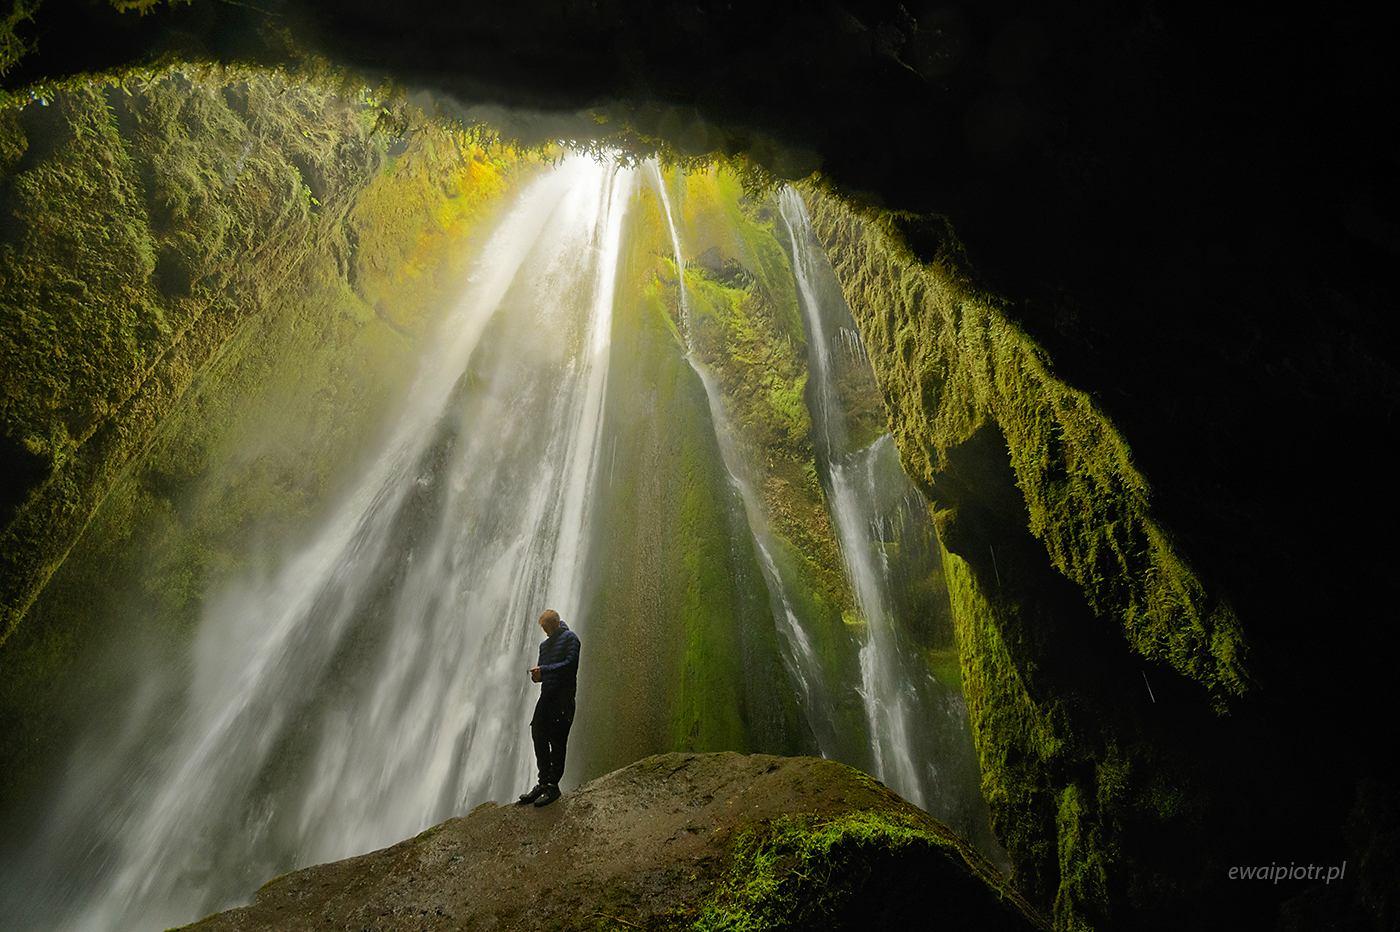 Stojąc pod wodospadem Gljufrabui, Islandia